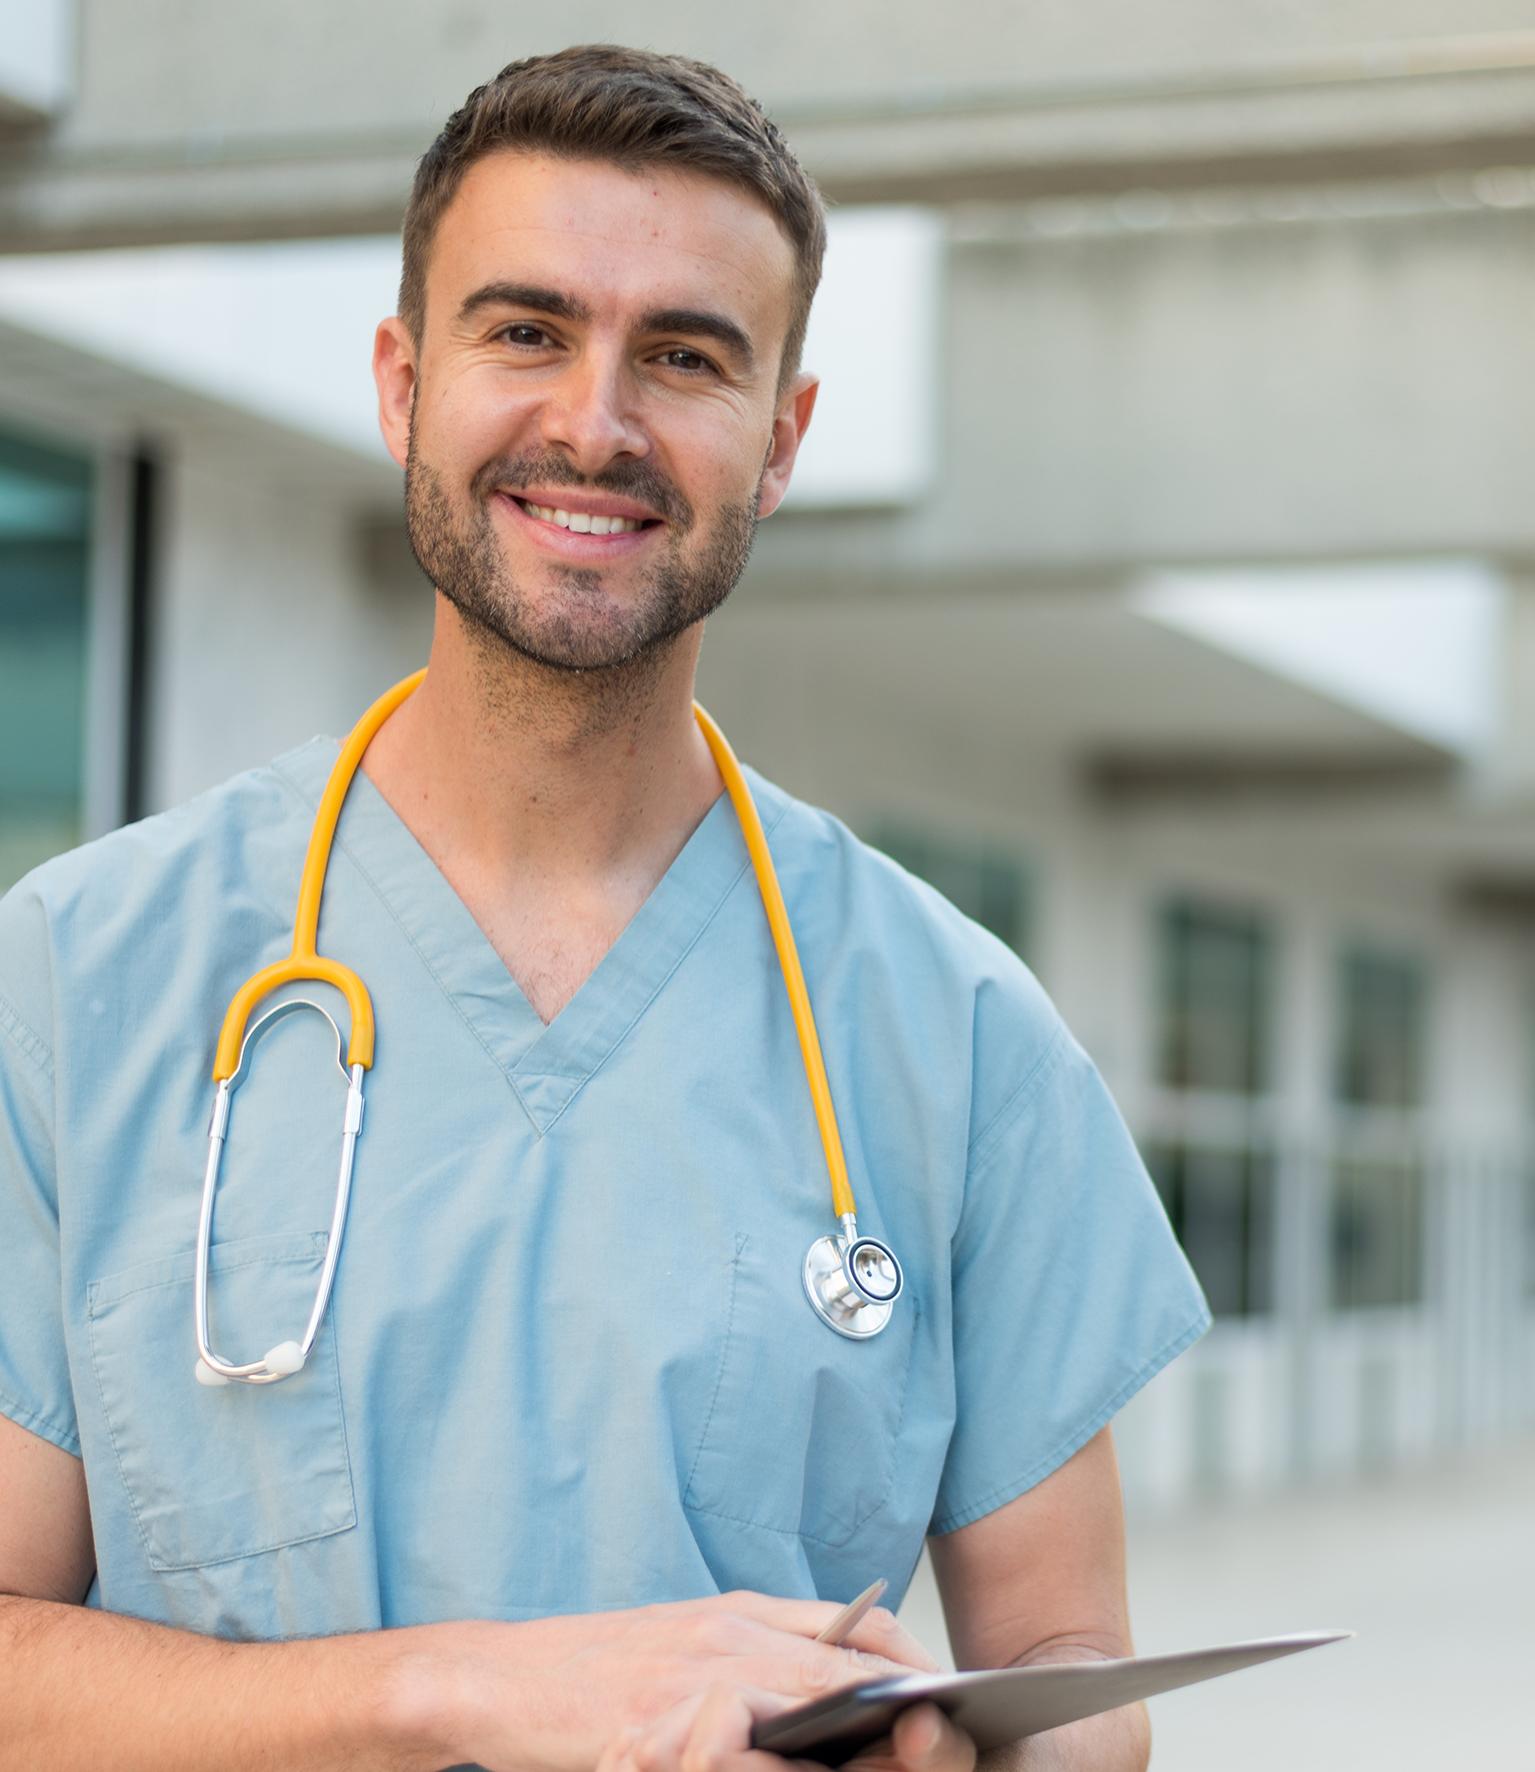 Healthcare highlight